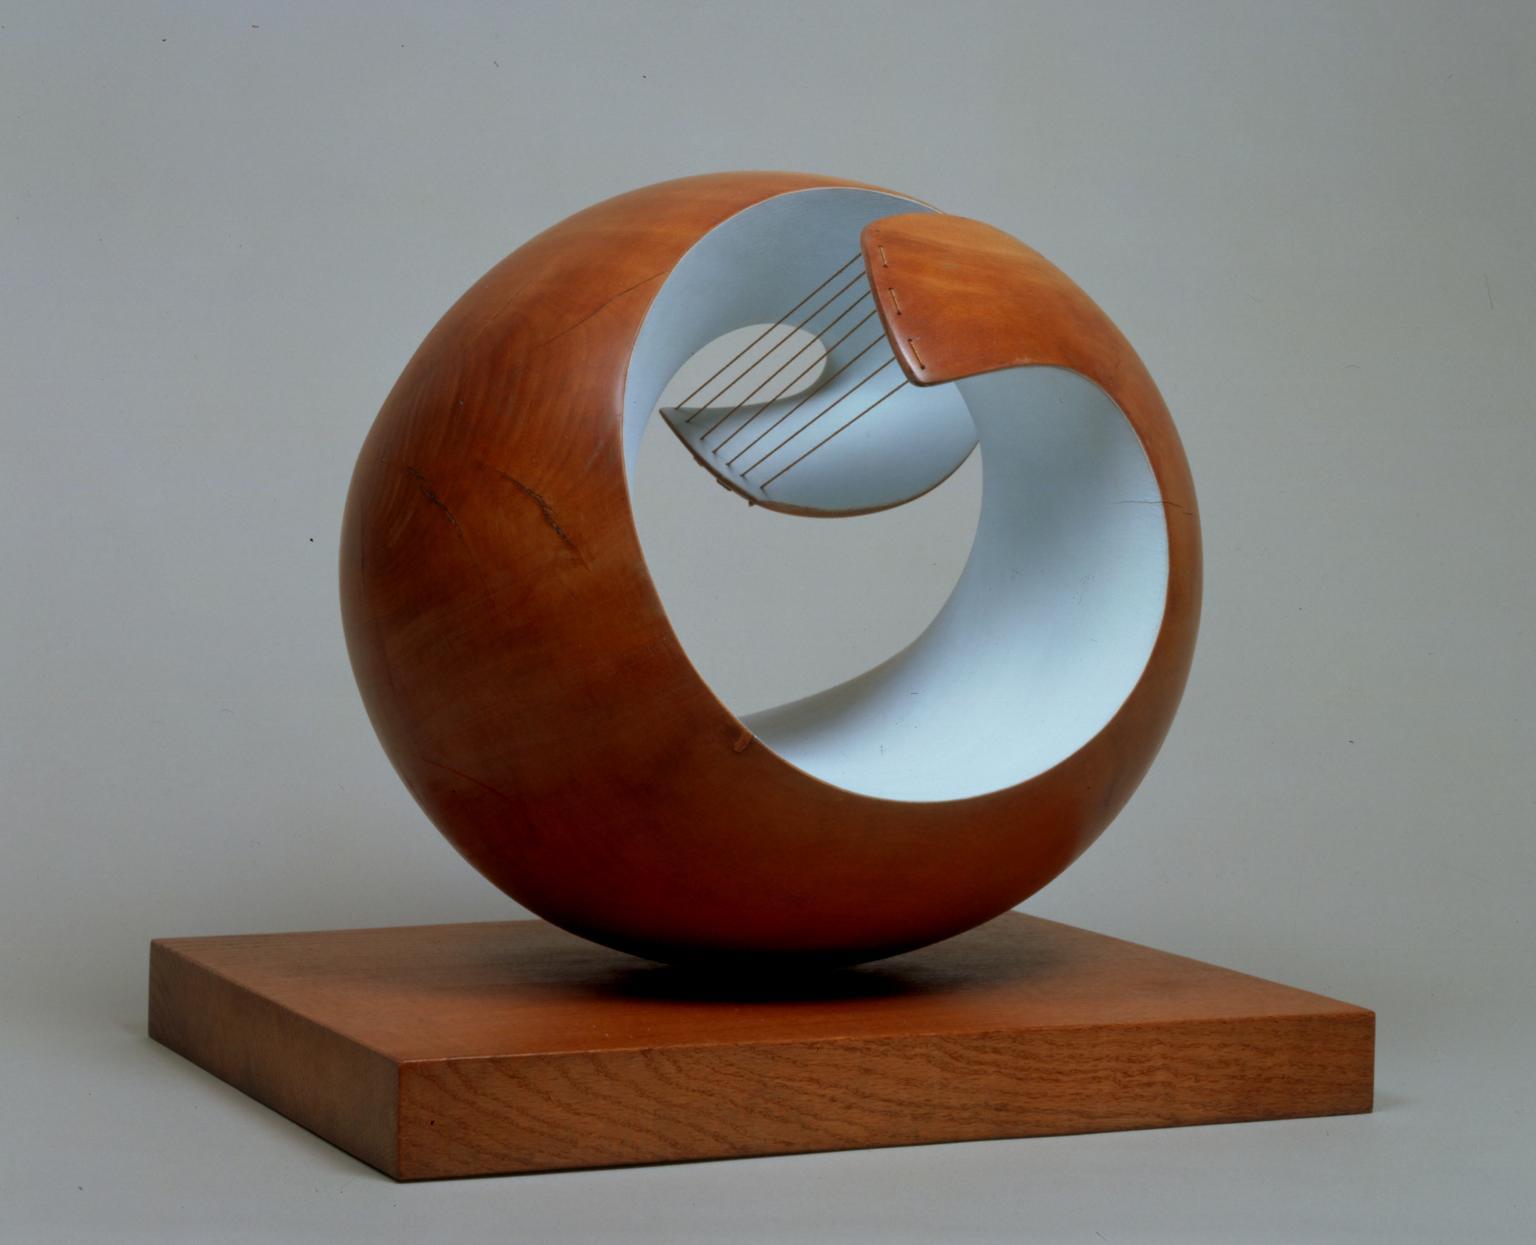 Dame Barbara Hepworth, 'Pelagos' 1946 Tate Modern